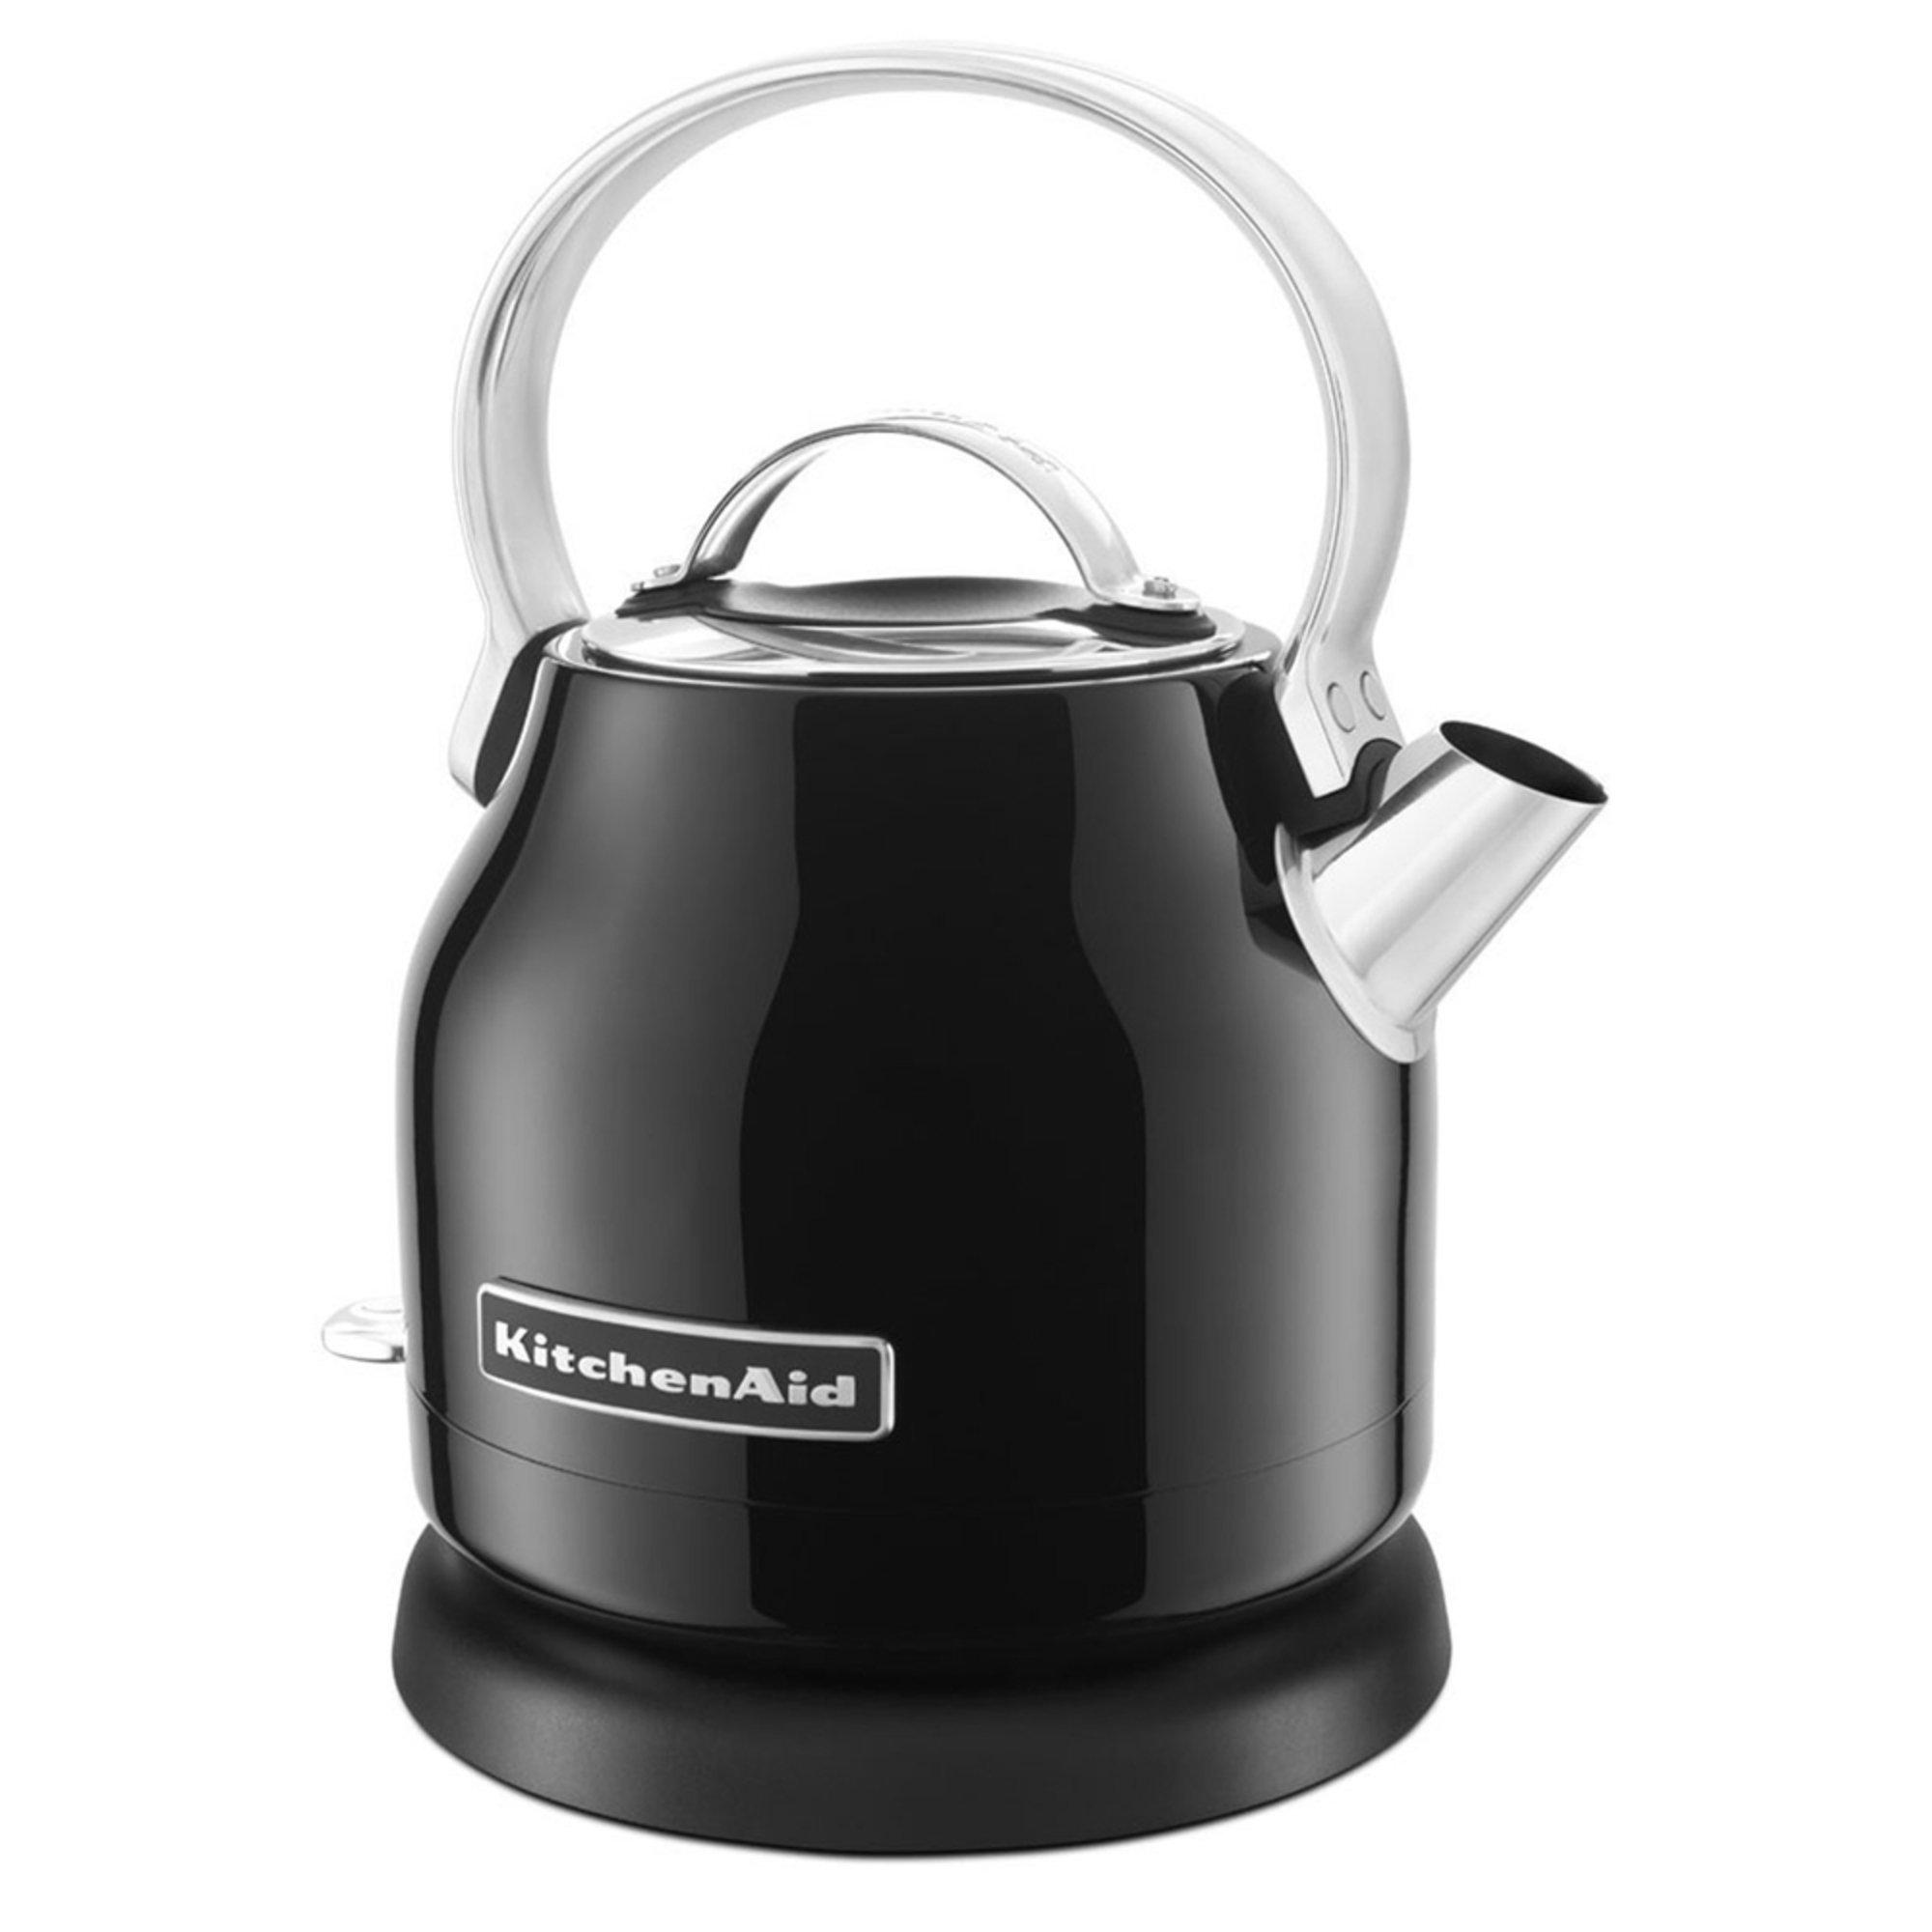 Black Kitchenaid Kettle: Kitchenaid 1.25-liter Small Space Electric Kettle